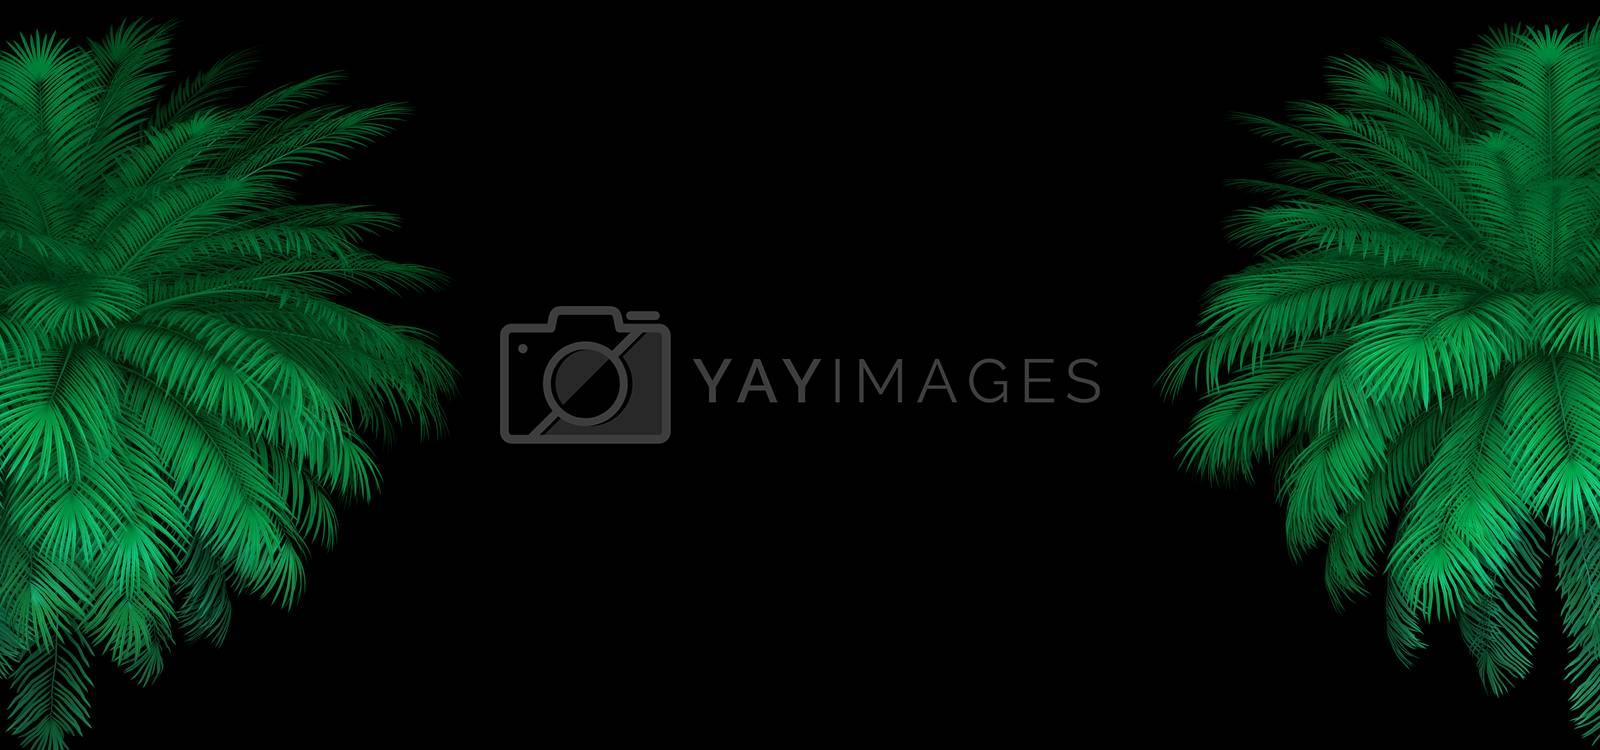 3d render of neon palm leaves on the black. Banner design. Retrowave, synthwave, vaporwave illustration. Party and sales concept